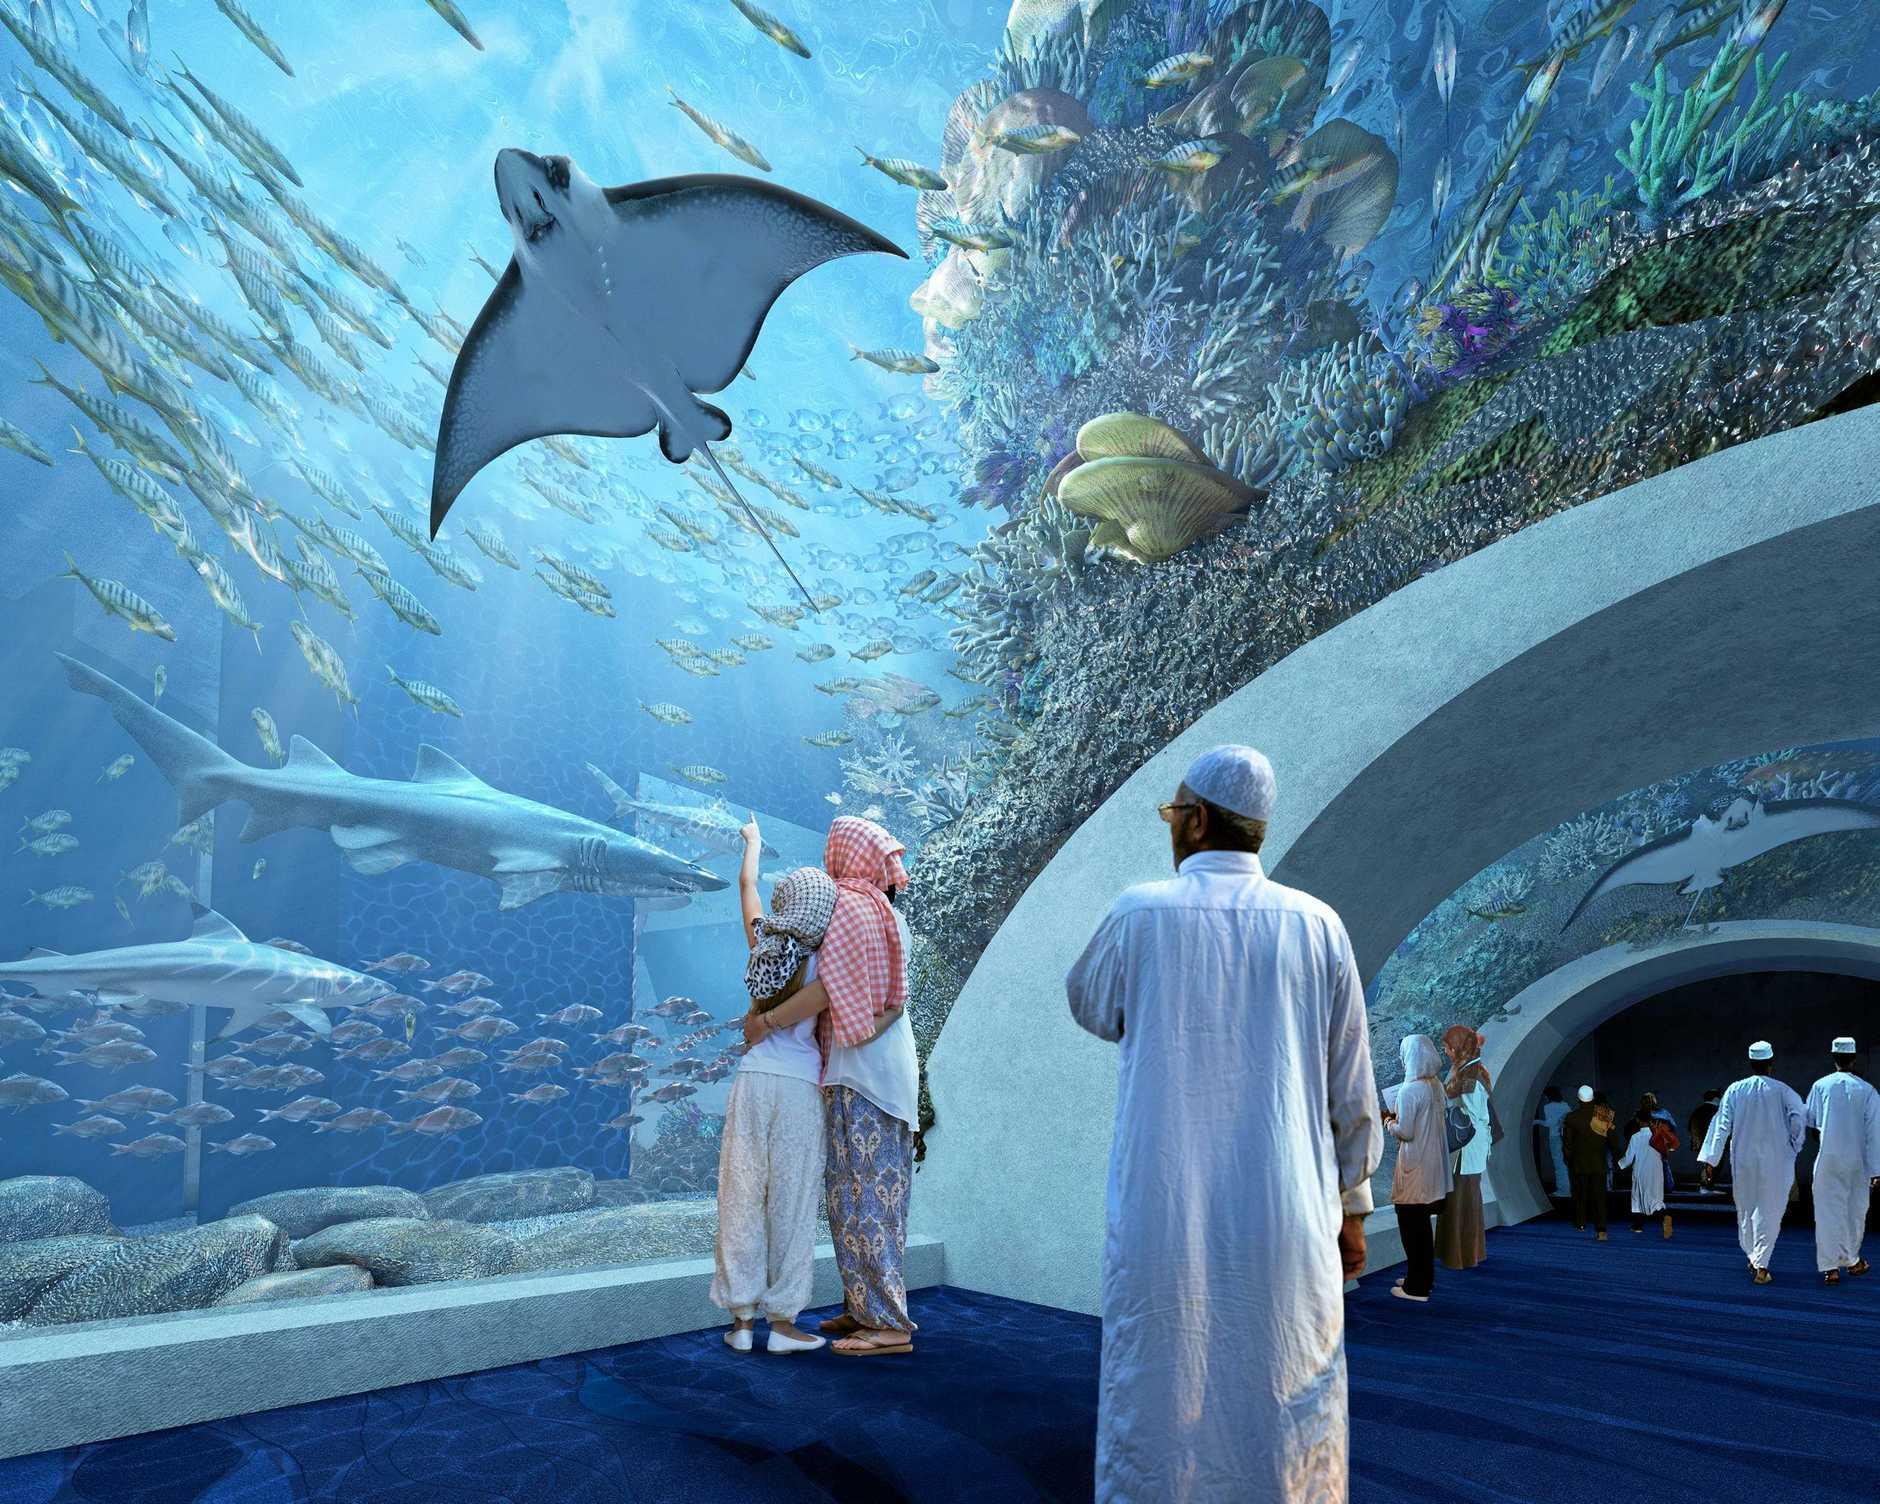 An artist's impression of main aquarium tunnel at the public aquarium in Muscat, Oman, built by Advanced Aquarium Technologies.